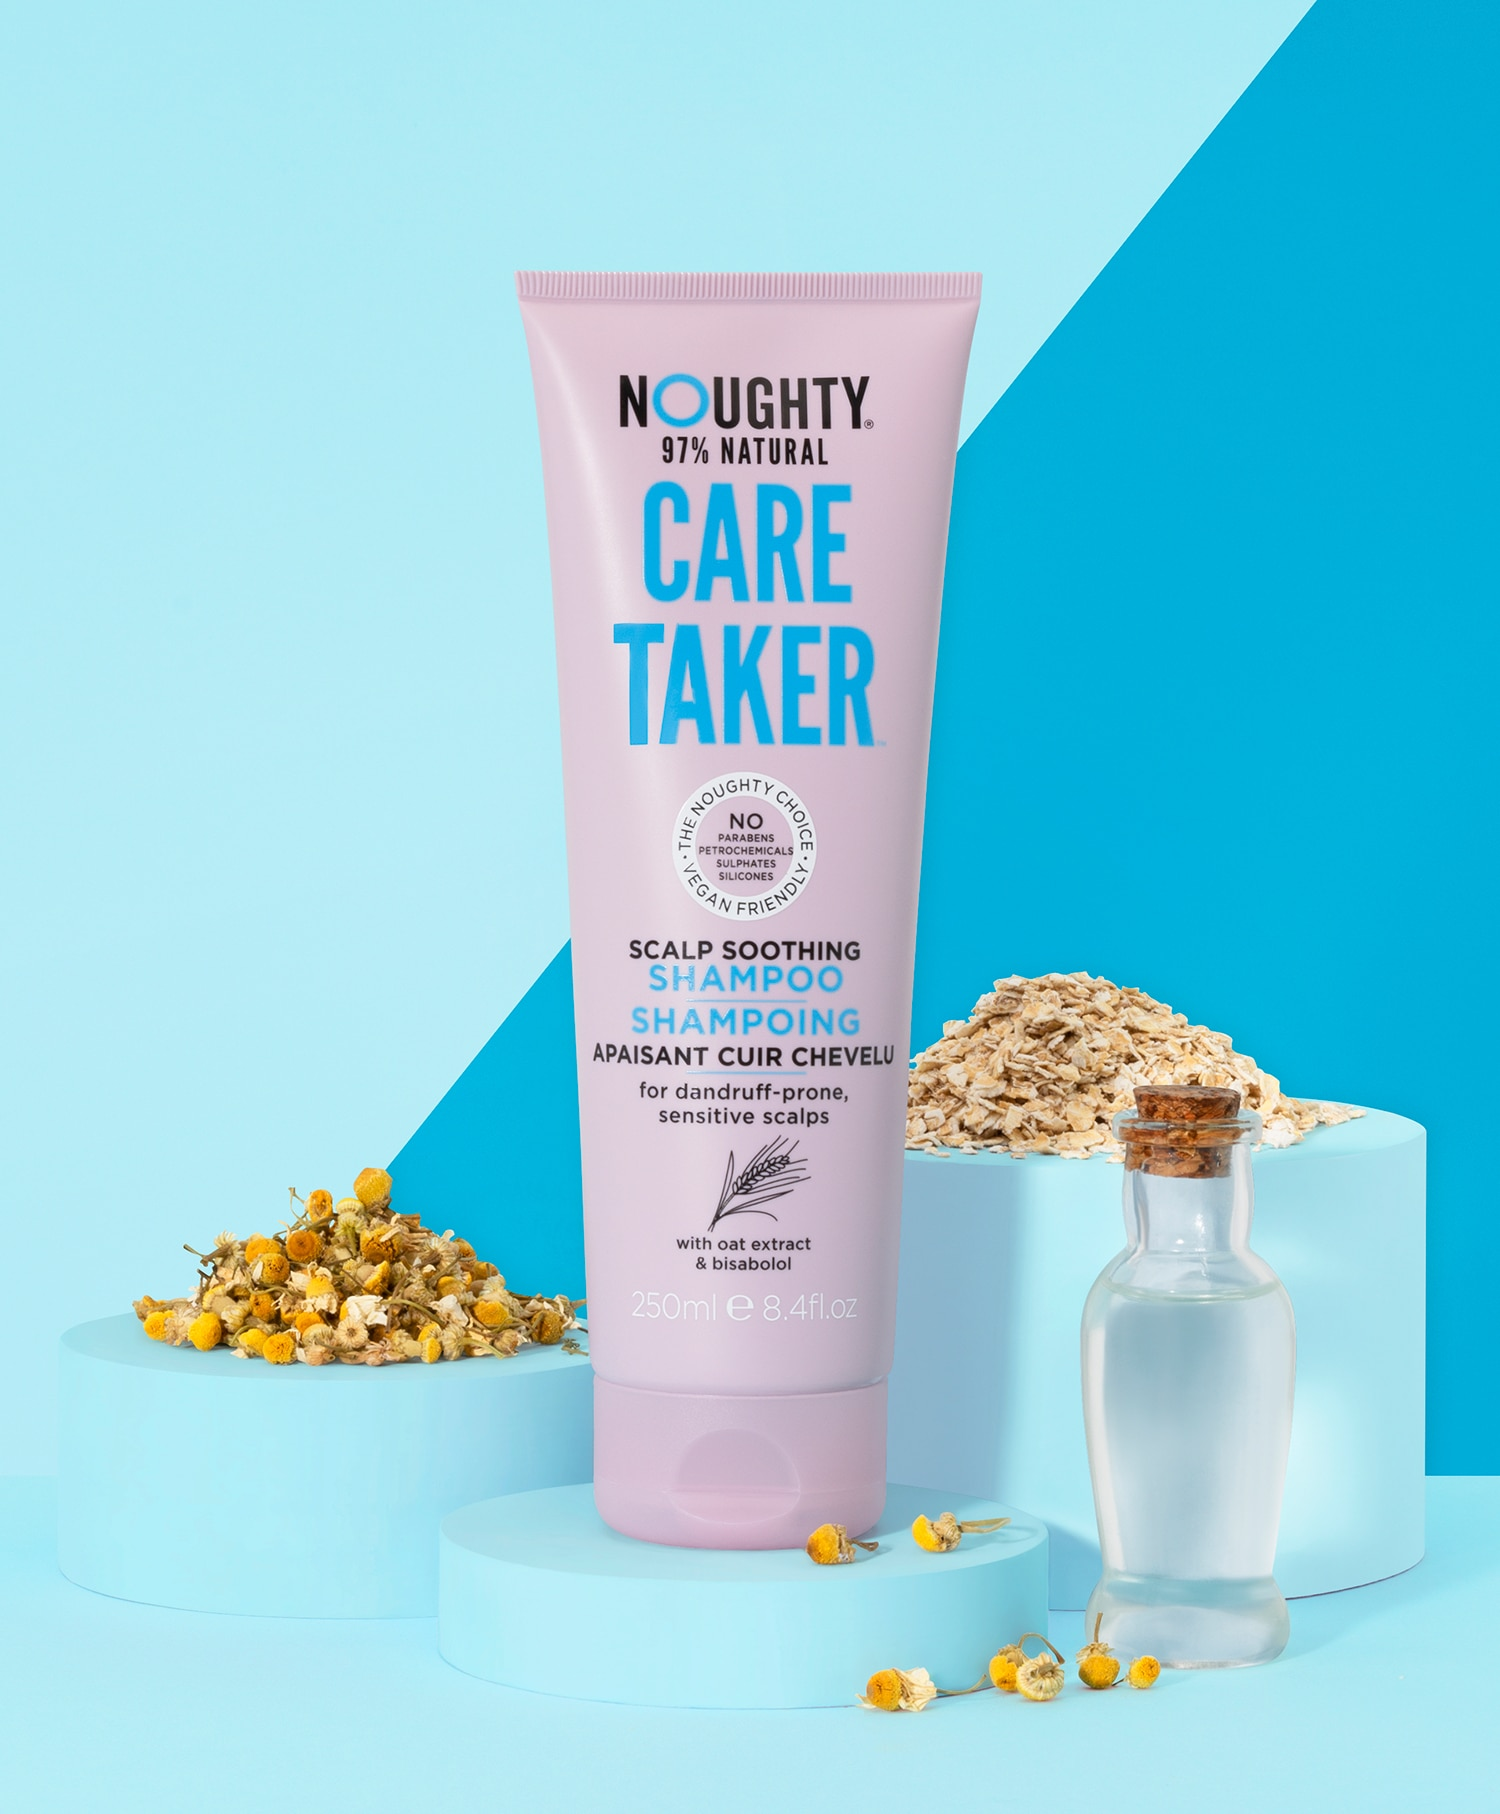 Noughty Care Taker Shampoo